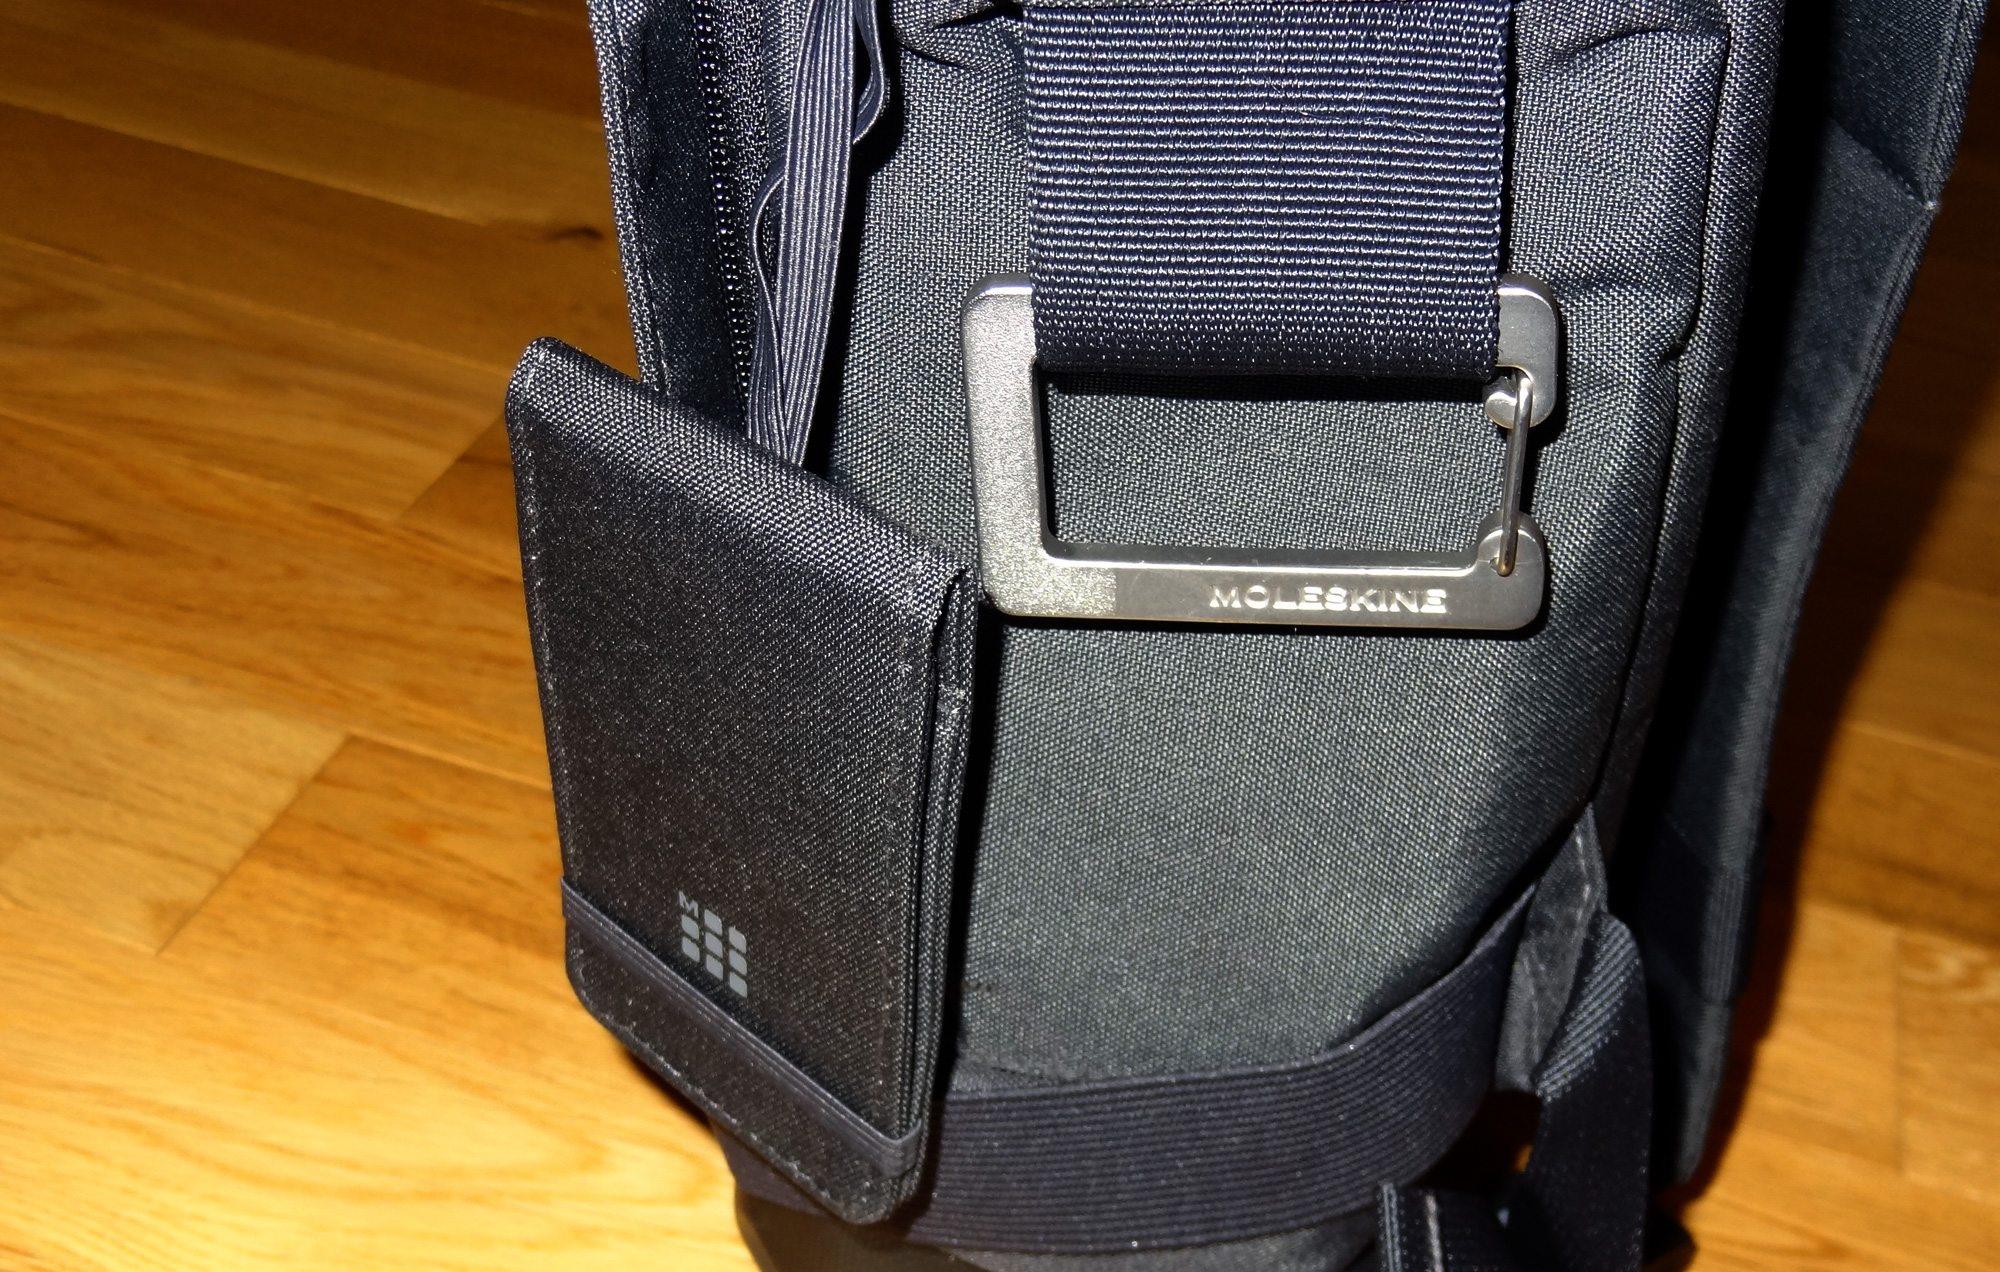 Moleskine Bag